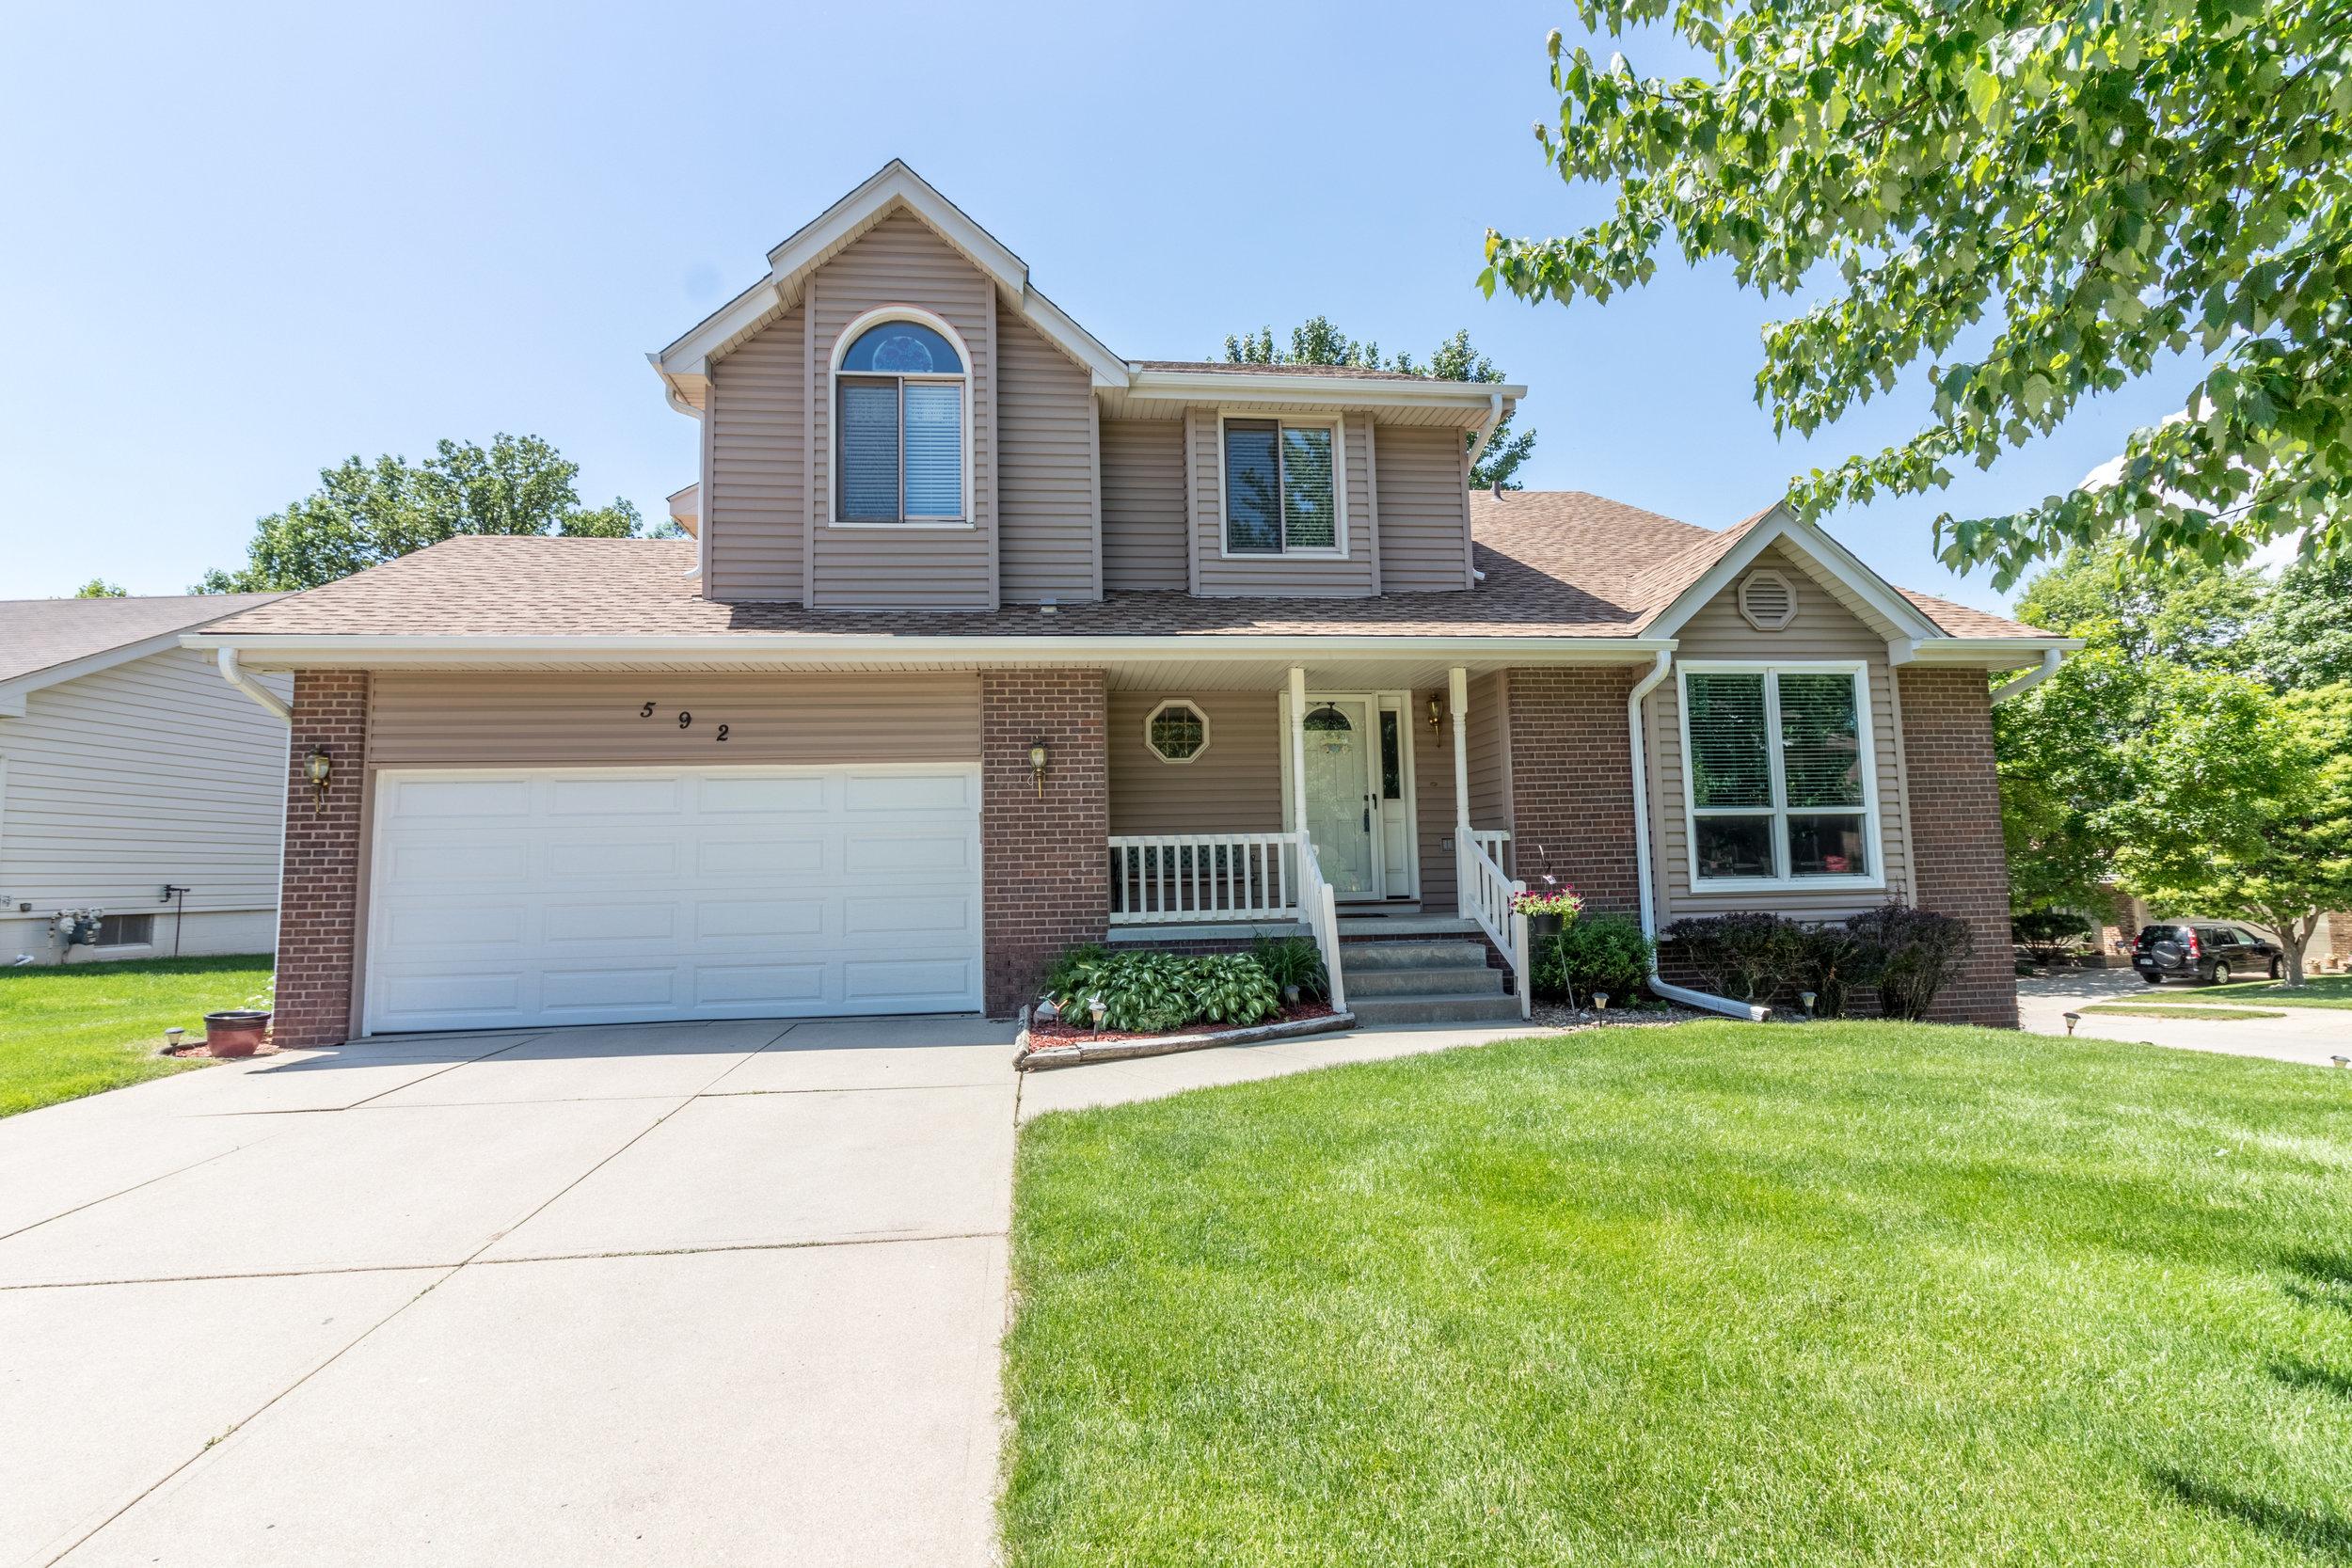 Home - 3315 N 101st Street | Omaha| $159,000